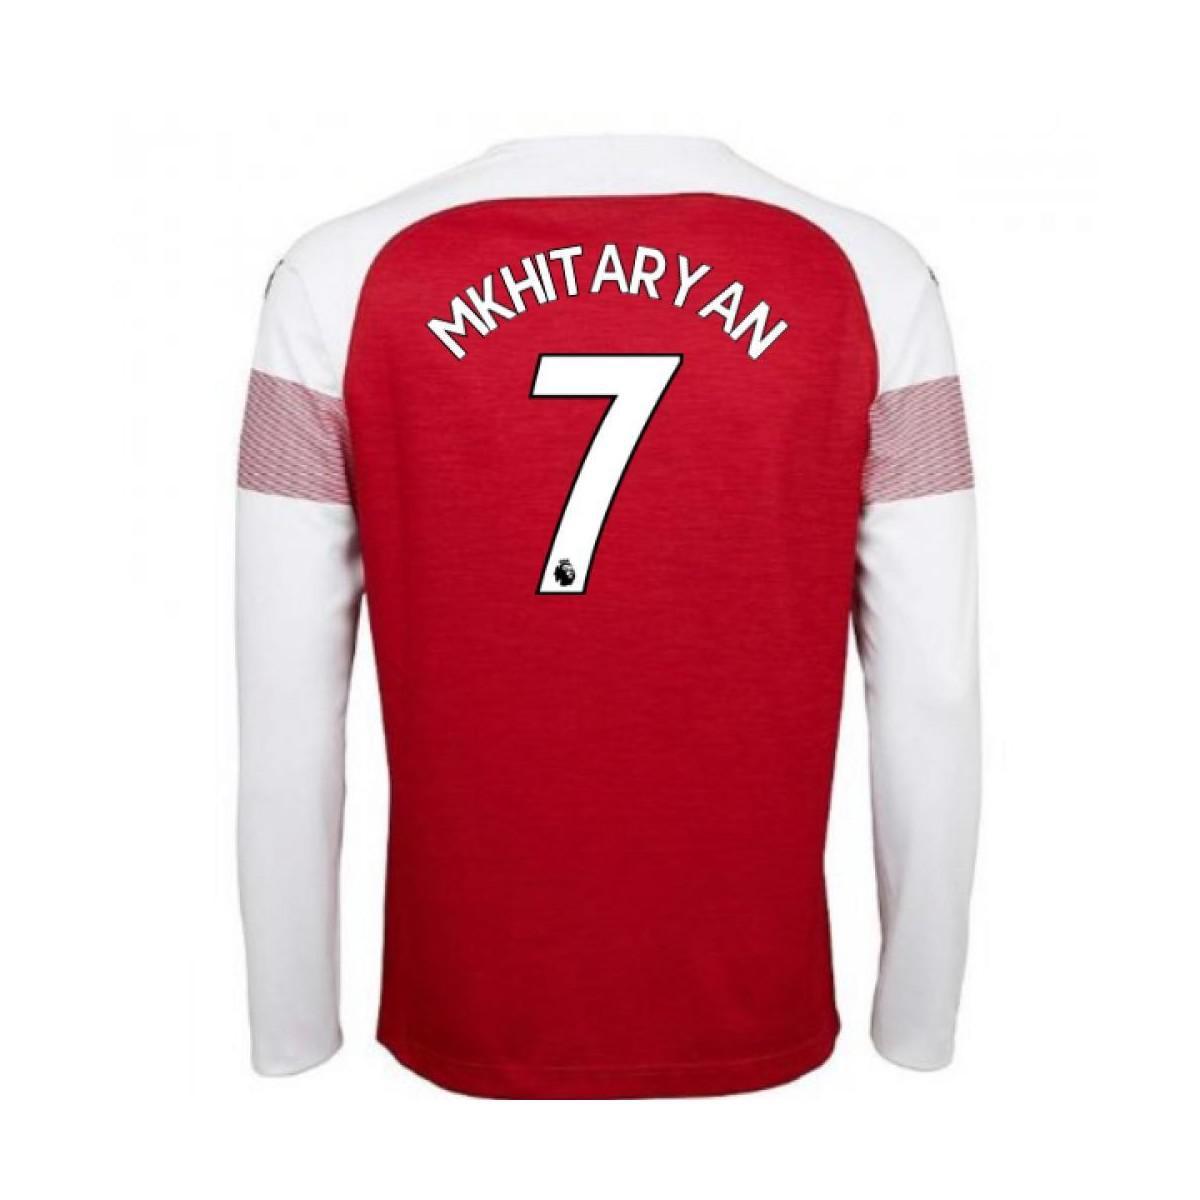 Puma 2018-2019 Arsenal Home Long Sleeve Shirt (mkhitaryan 7) Men s ... 195001697